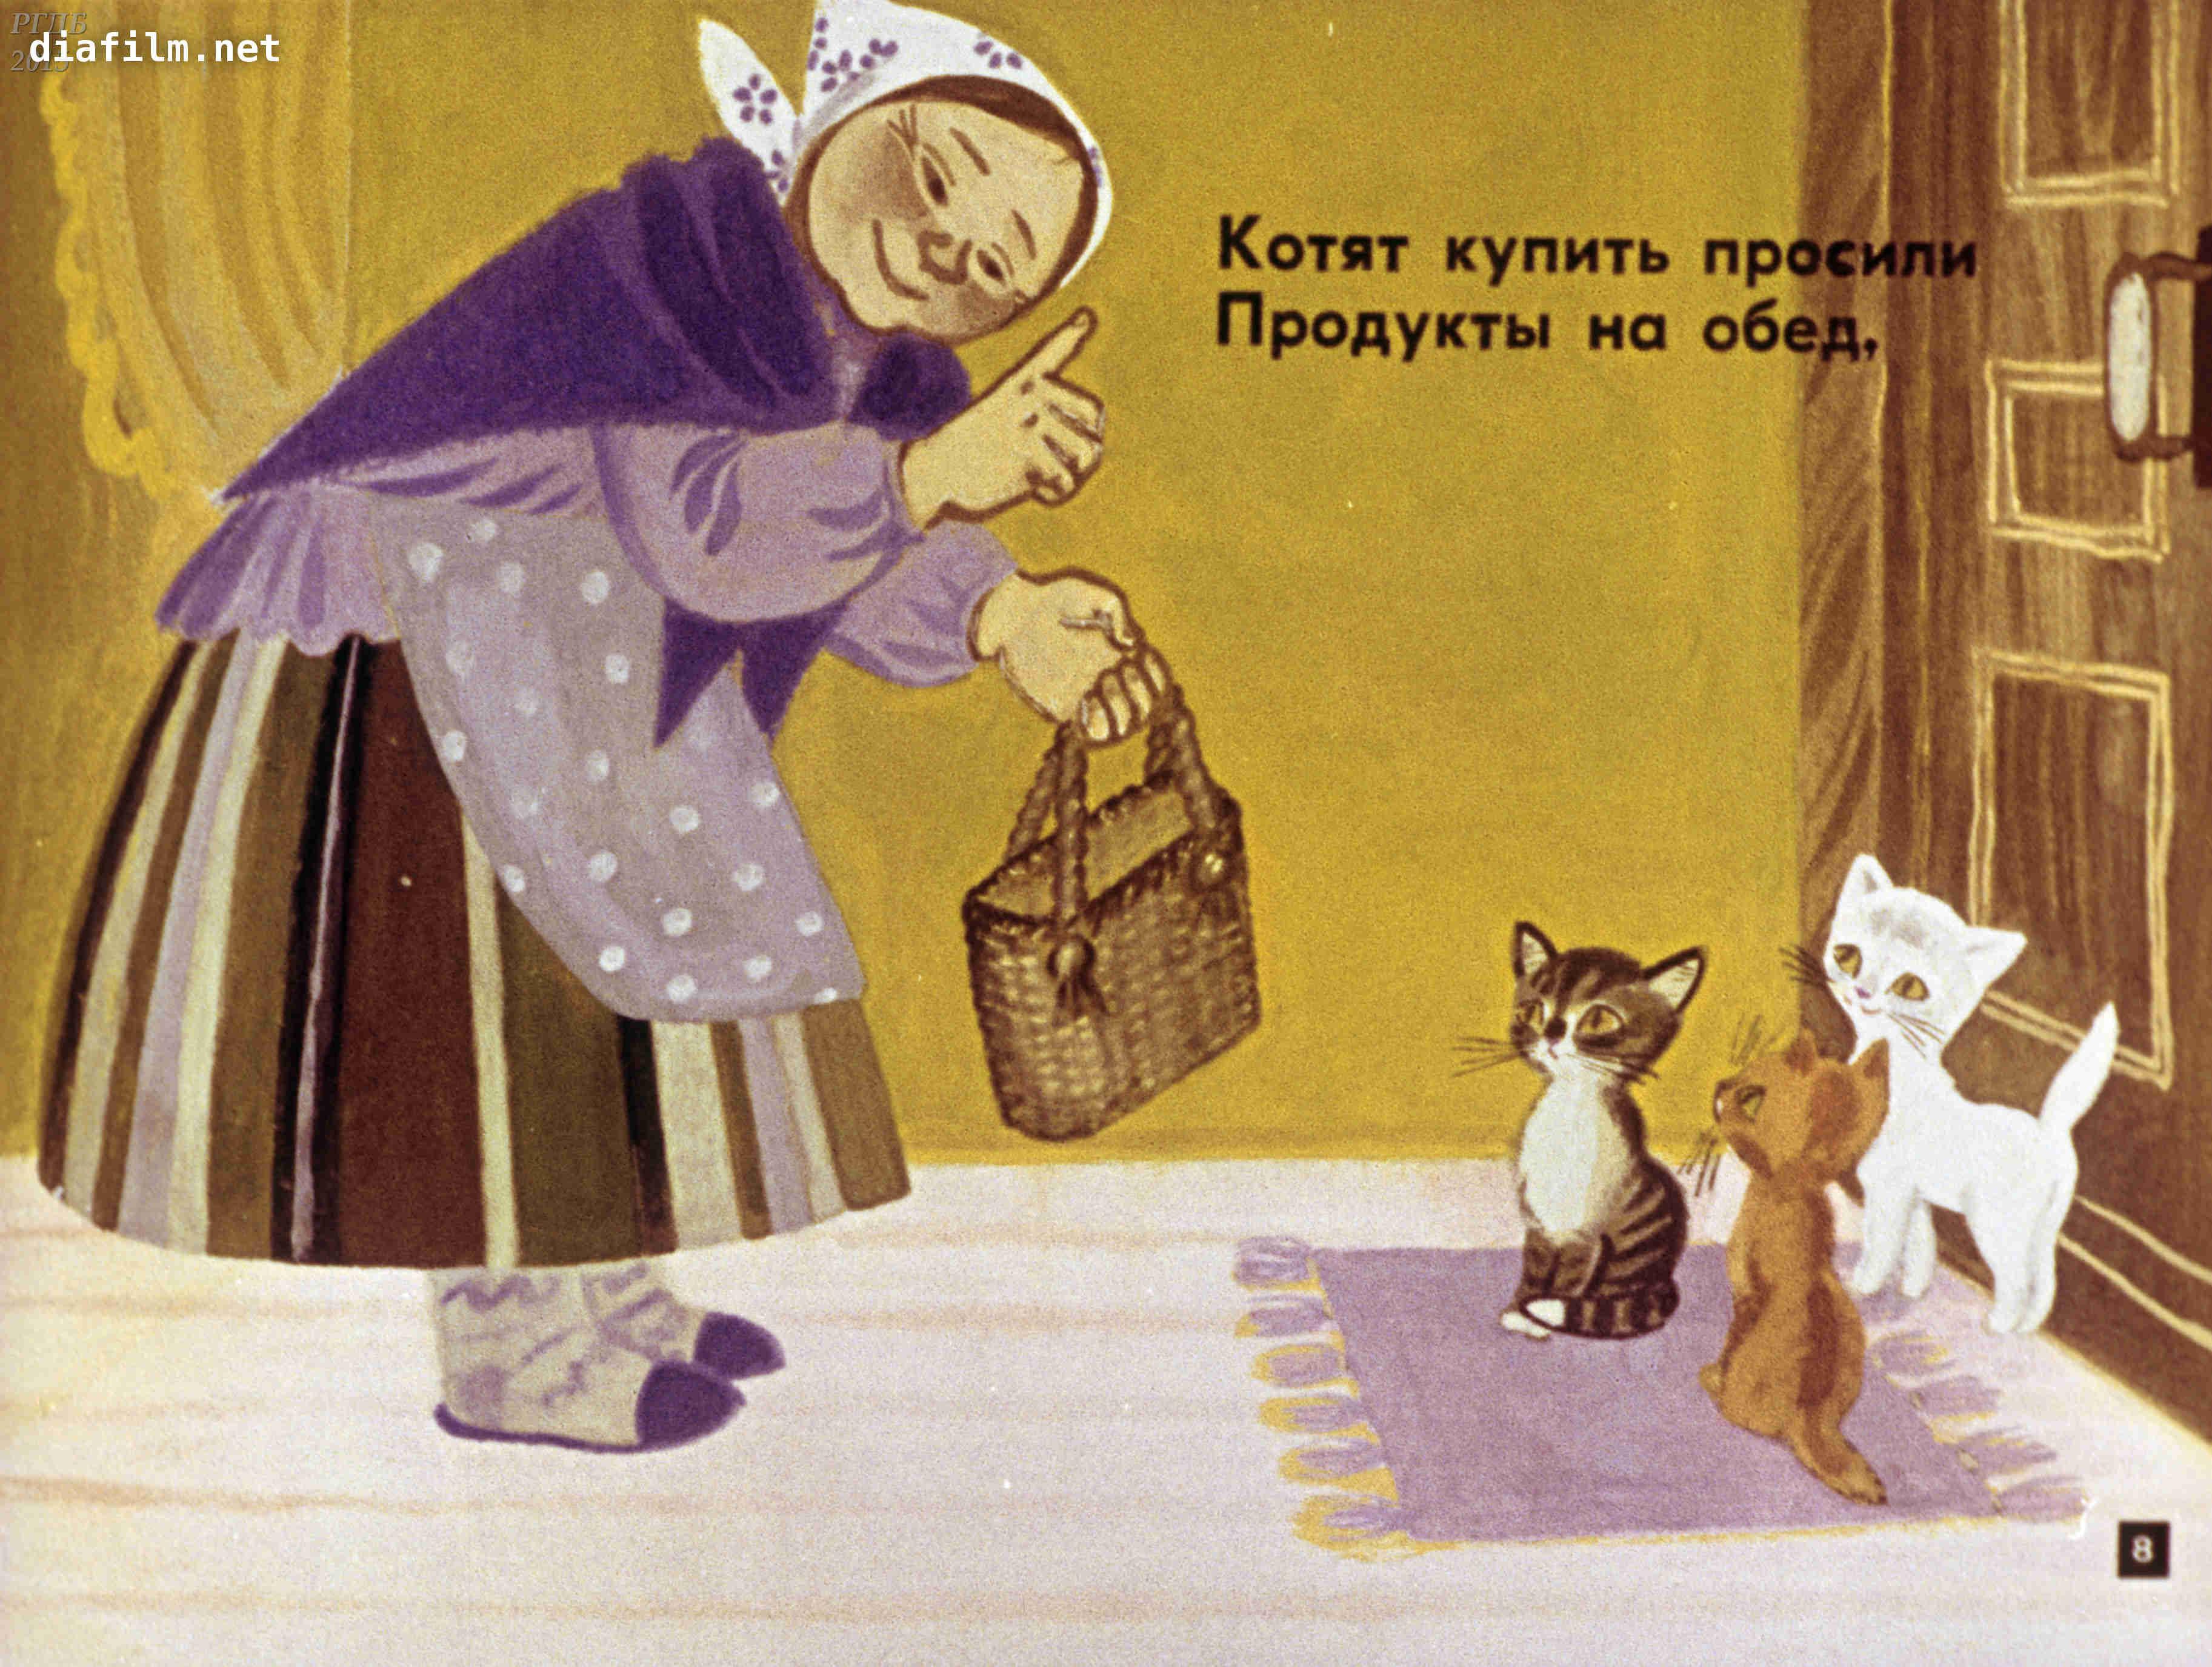 Котята токмакова читать с картинками, картинки